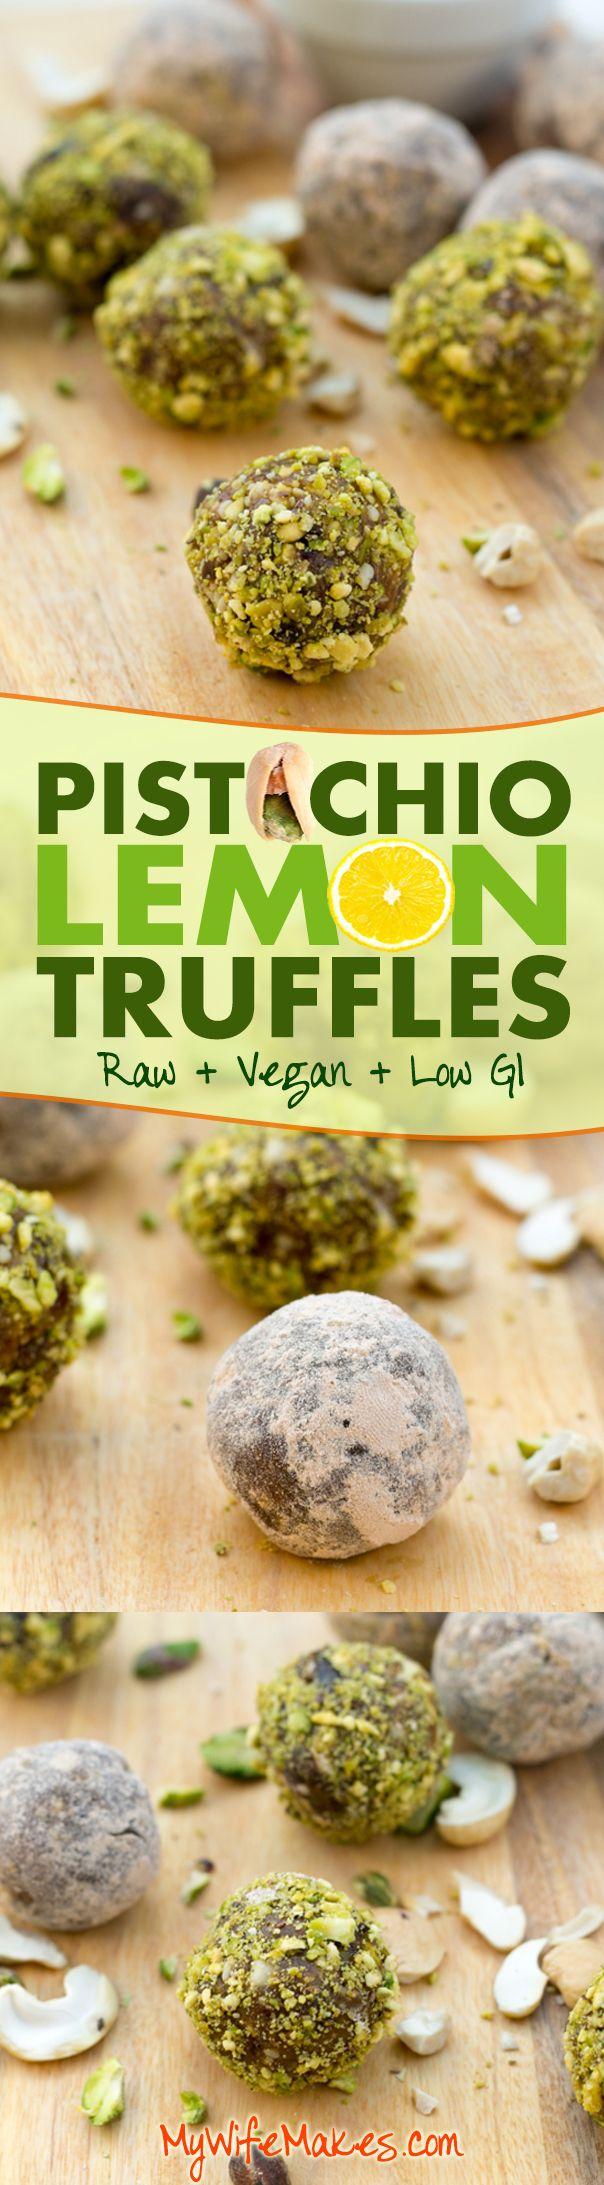 Delicious Pistachio Lemon Truffles: raw, vegan and gluten-free. #paleo #dessert